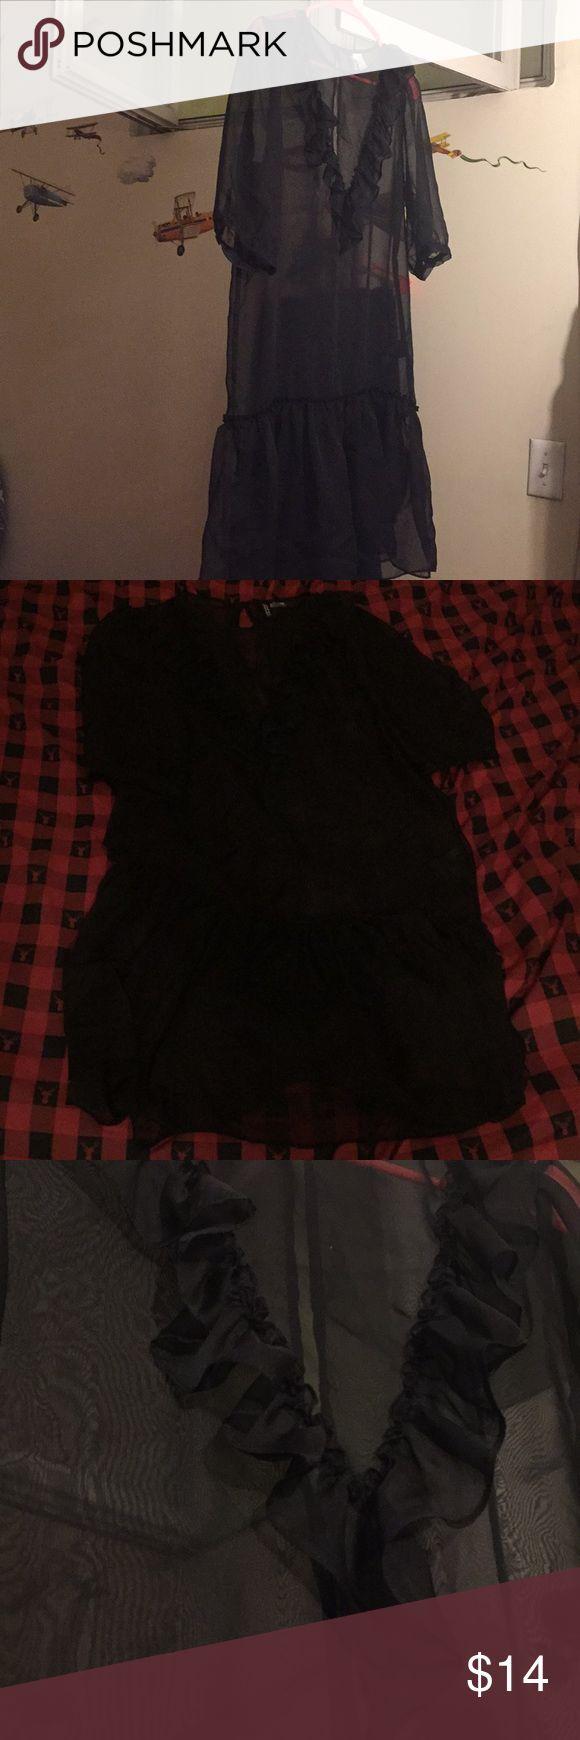 H&M Black see thru dress see thru dress from H&M. Nice and super cute H&M Dresses Midi